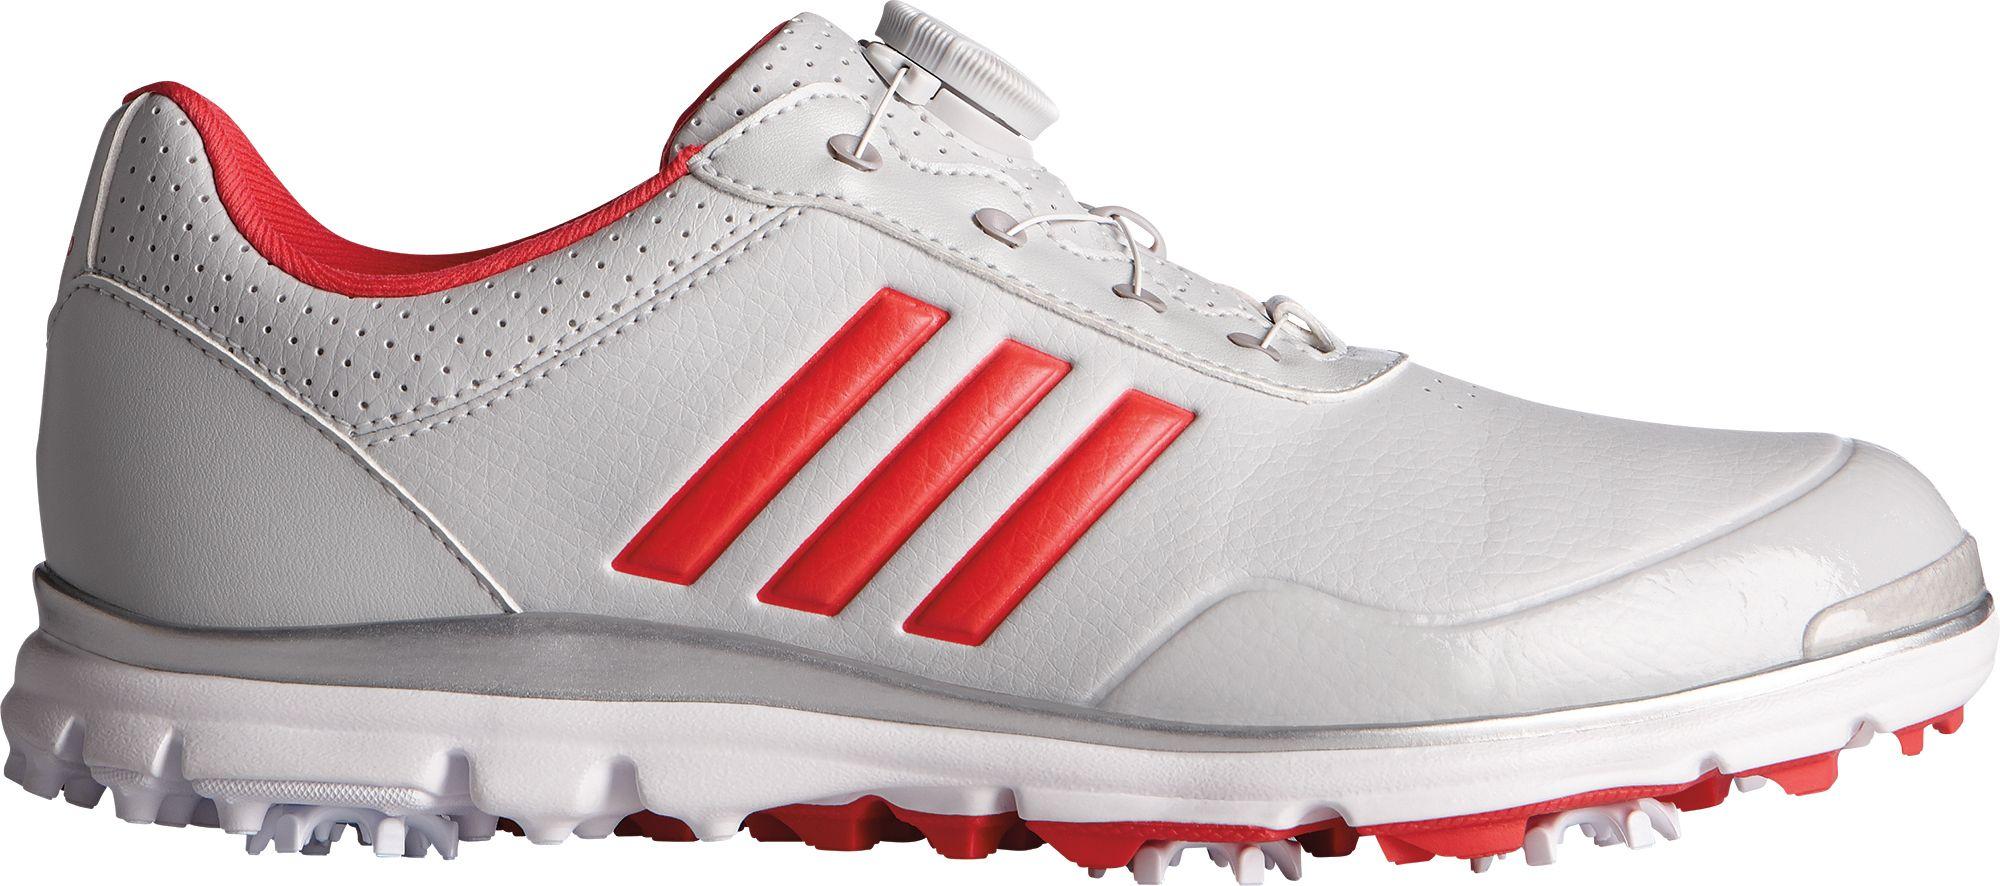 W Adistar Lite Chaussures De Boa De Golf Adidas wINJZiRh